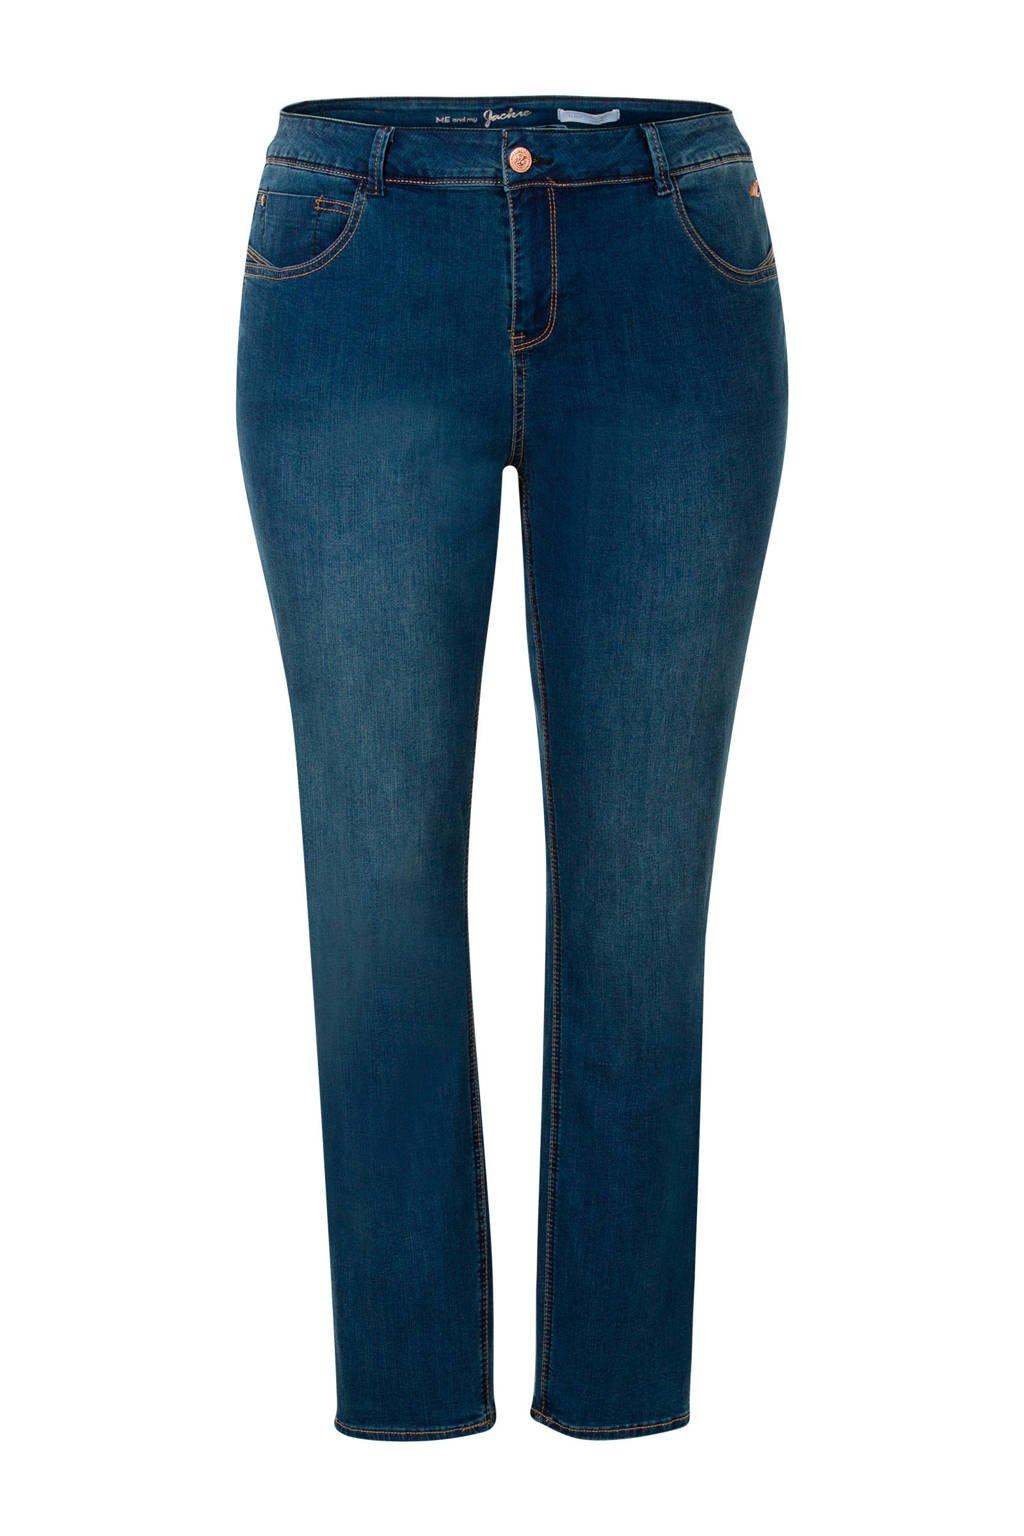 Jeans Miss Fit Plus Jackie Slim Cropped Etam qgH6gxFrwX